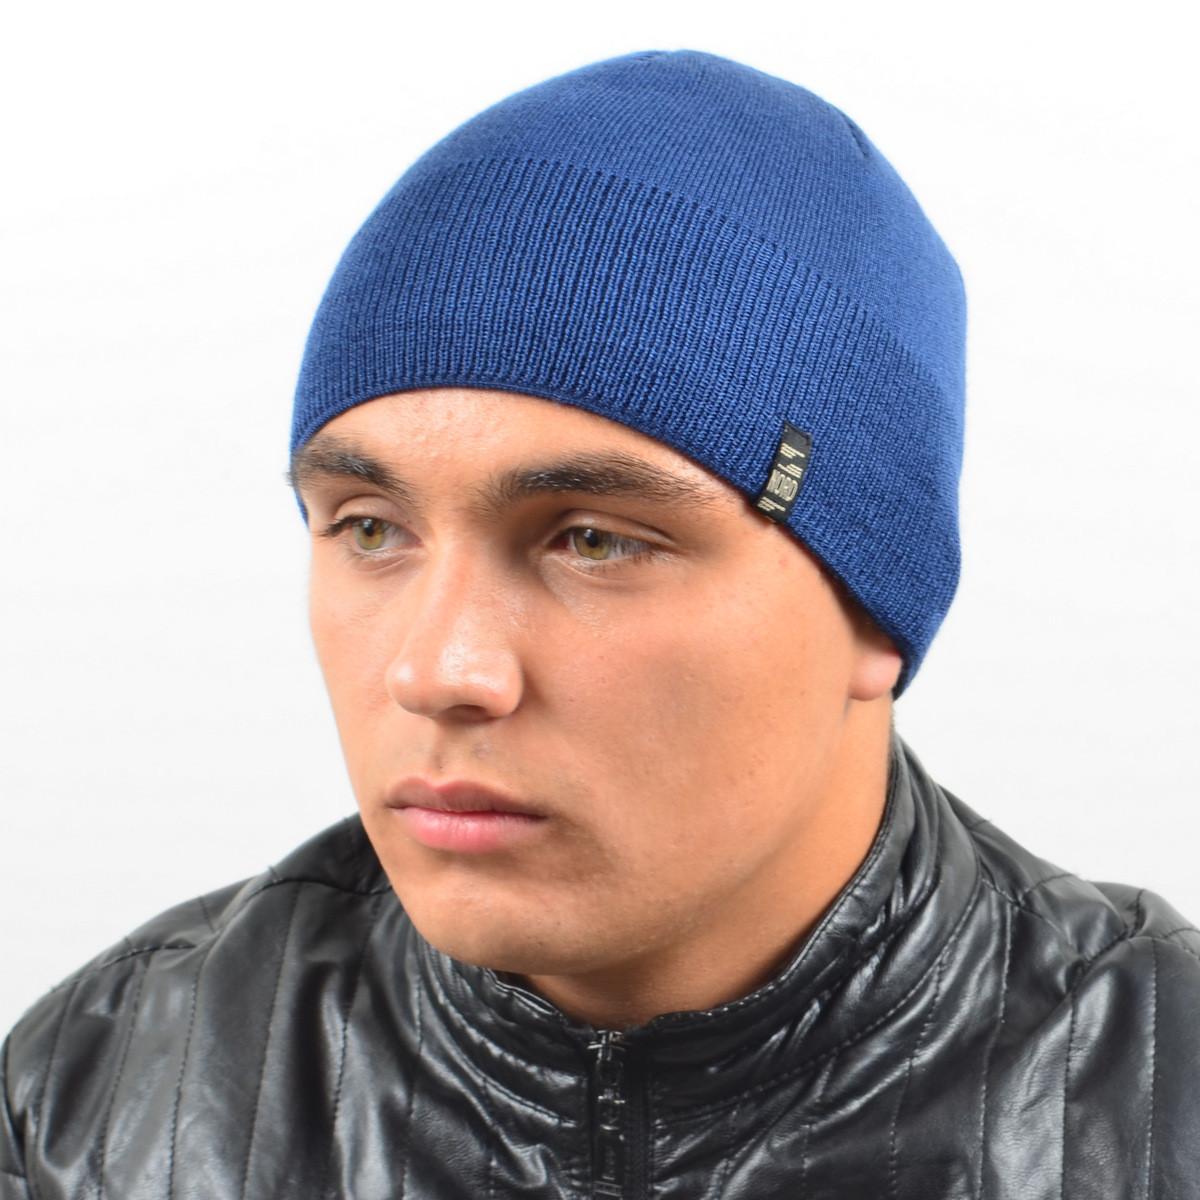 Мужская вязанная шапка NORD джинс